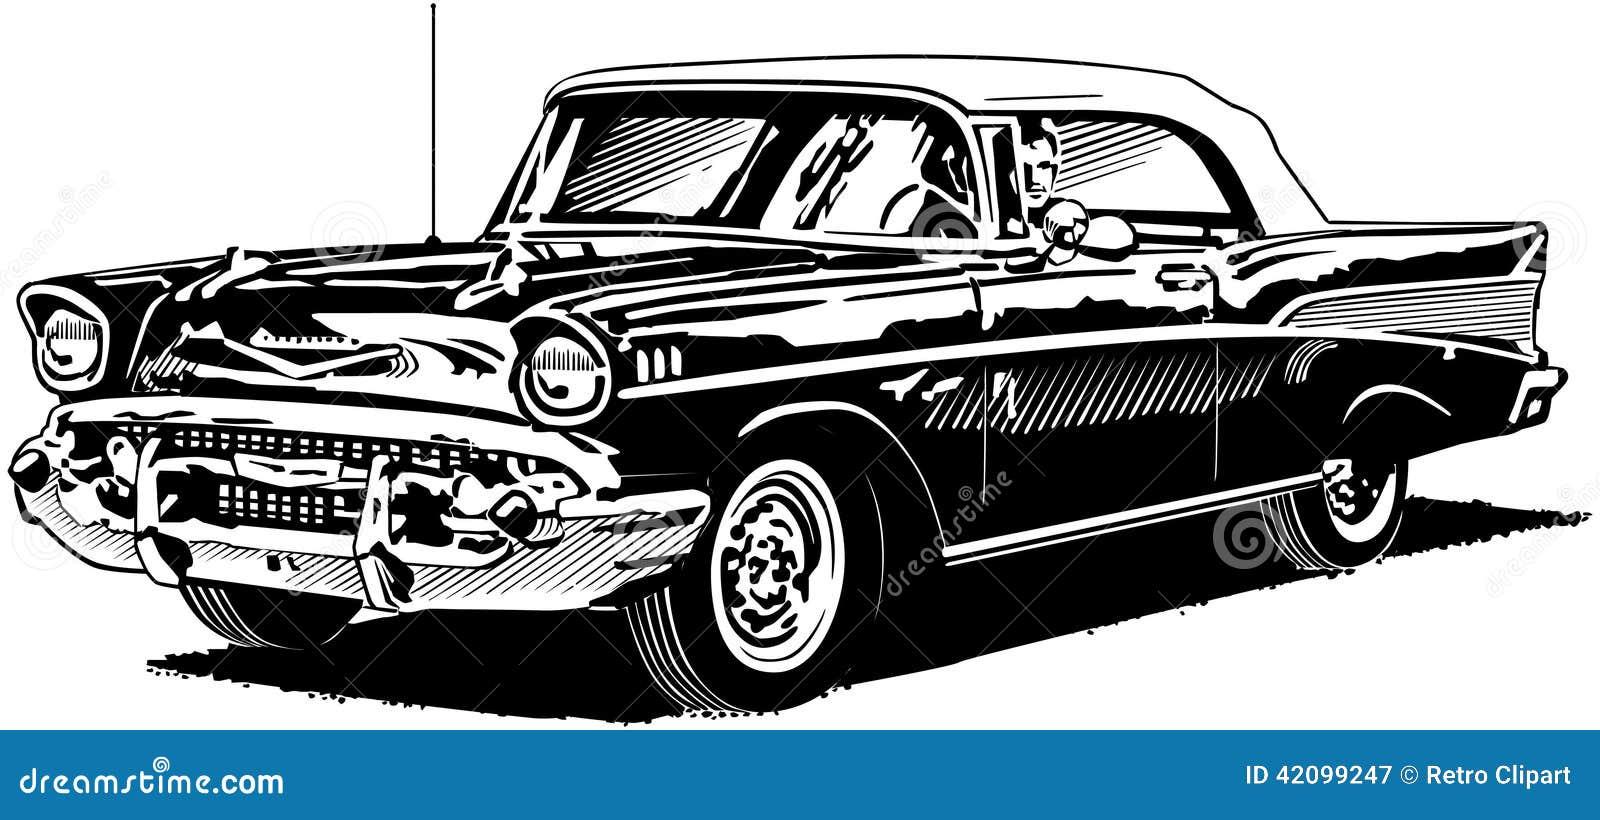 57 chevy stock vector illustration of transportation 42099247 rh dreamstime com 57 chevrolet clipart 1957 chevy clip art